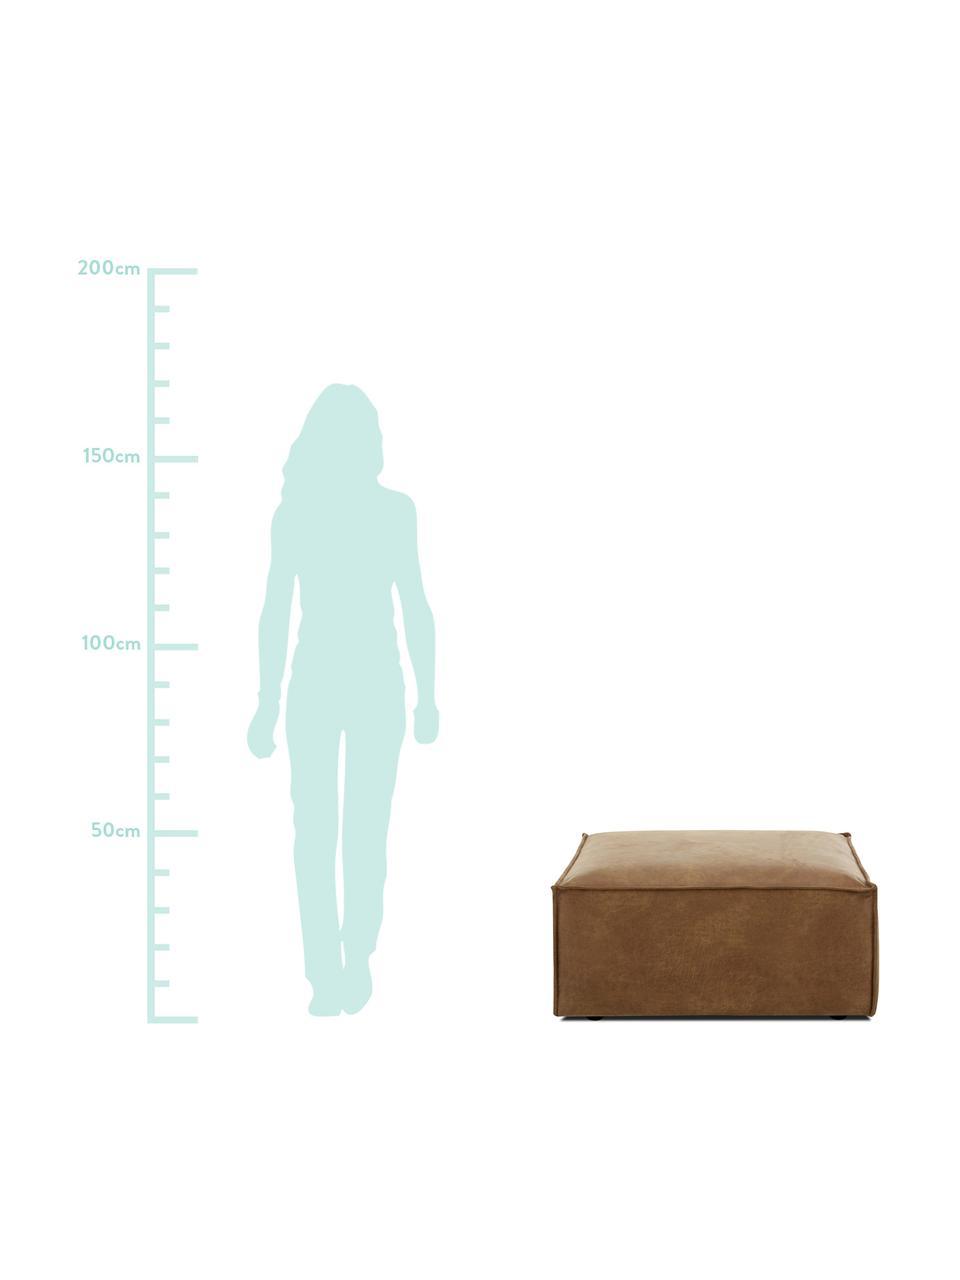 Sofa-Hocker Lennon in Braun aus recyceltem Leder, Bezug: Recyceltes Leder (70% Led, Gestell: Massives Kiefernholz, Spe, Füße: Kunststoff, Leder Braun, 88 x 43 cm